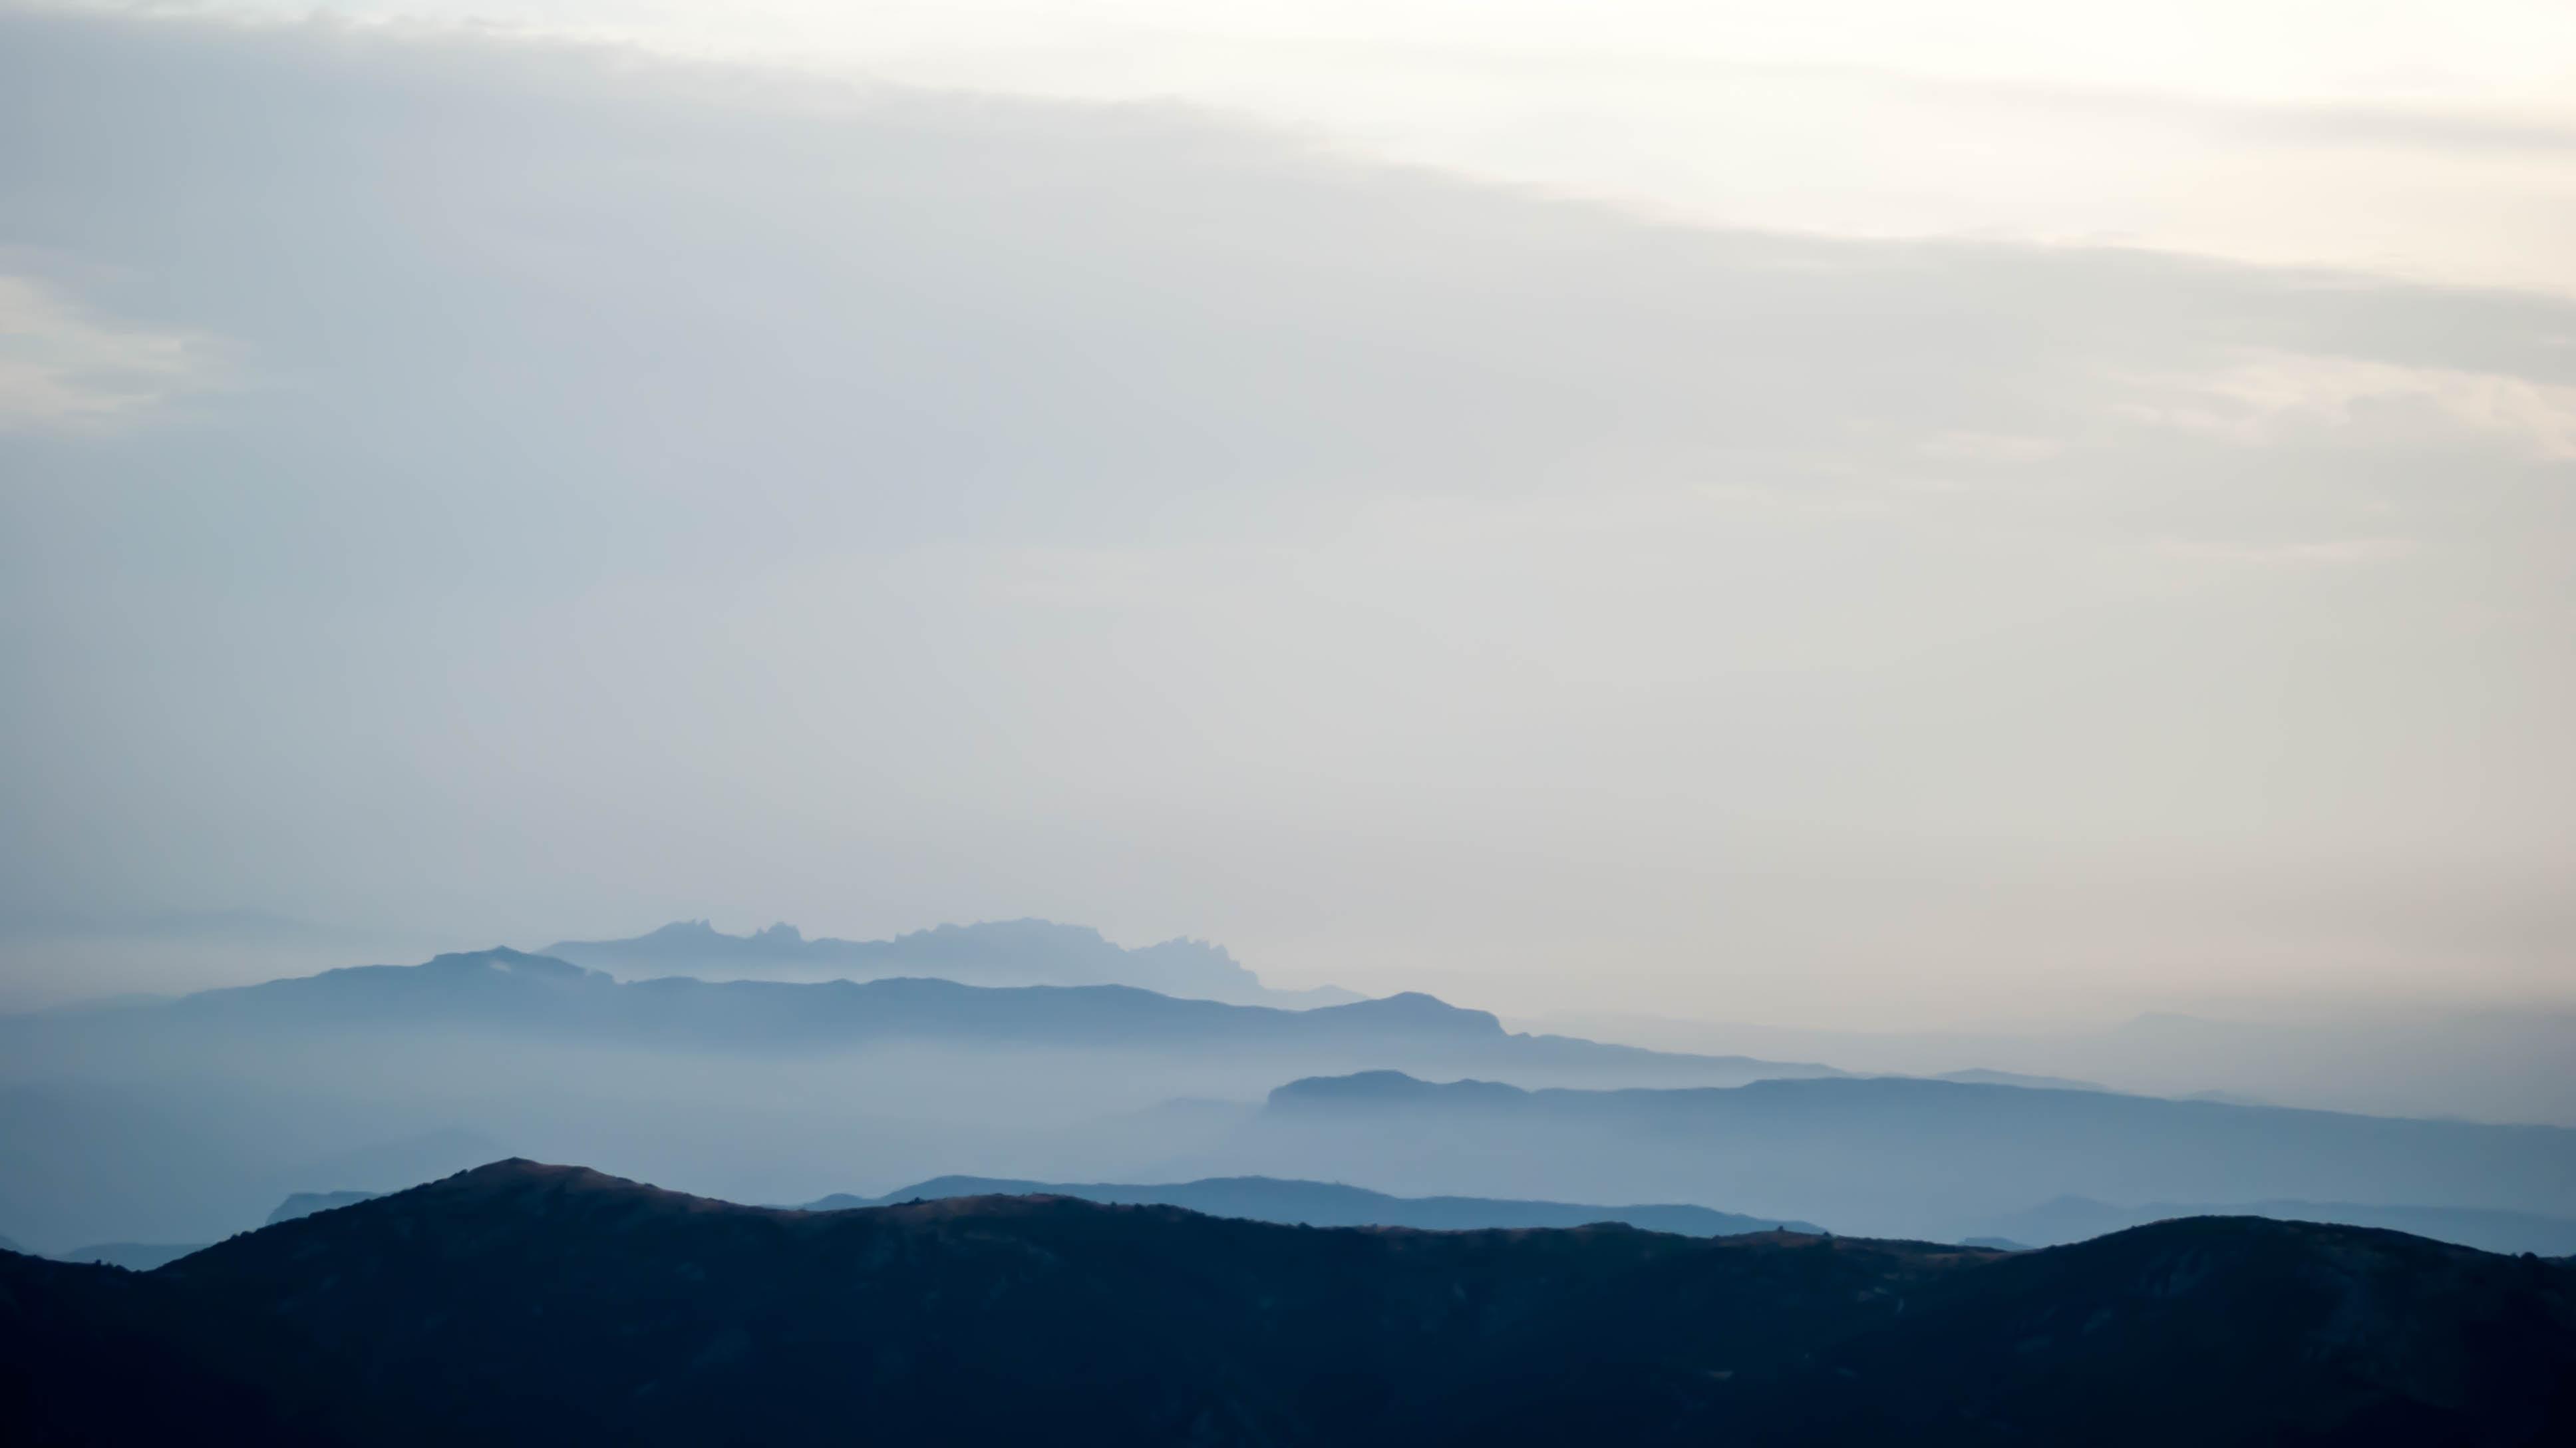 Hazy silhouettes of mountain ridges on a foggy day